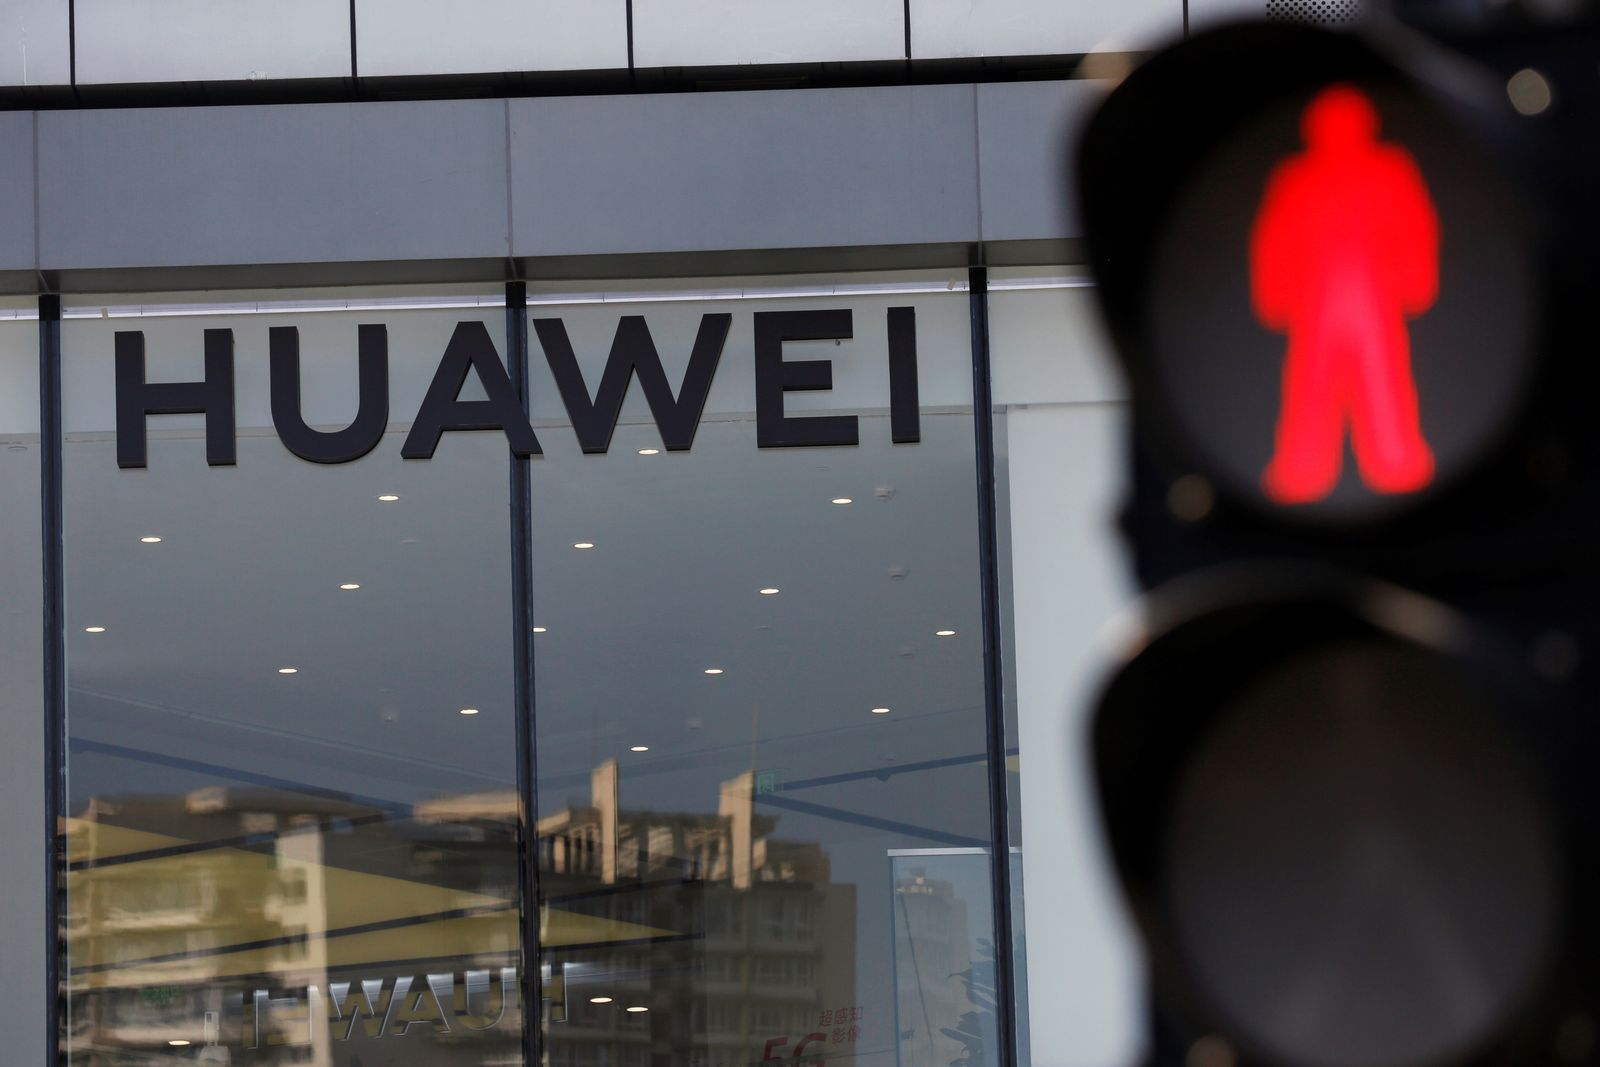 Huawei sign is seen on its store near a traffic light in Beijing